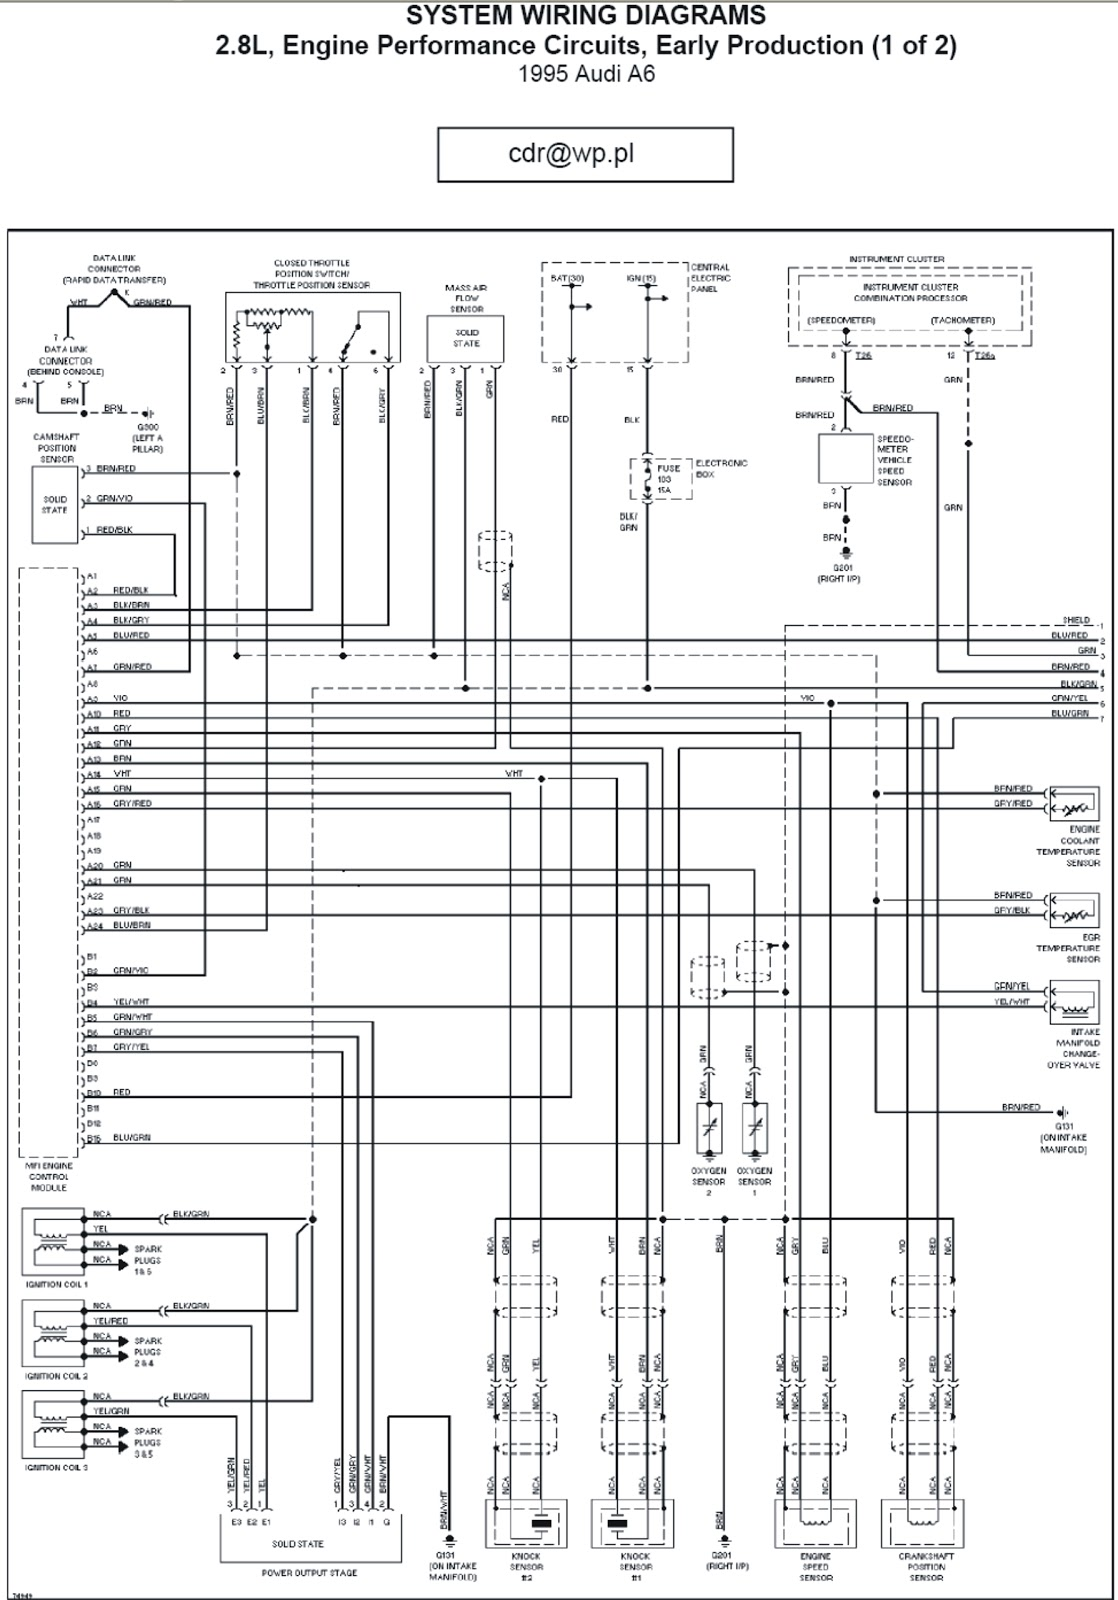 audi s6 c4 wiring diagram headlight wire diagram 2011 audi a6rh svlc us [ 1118 x 1600 Pixel ]